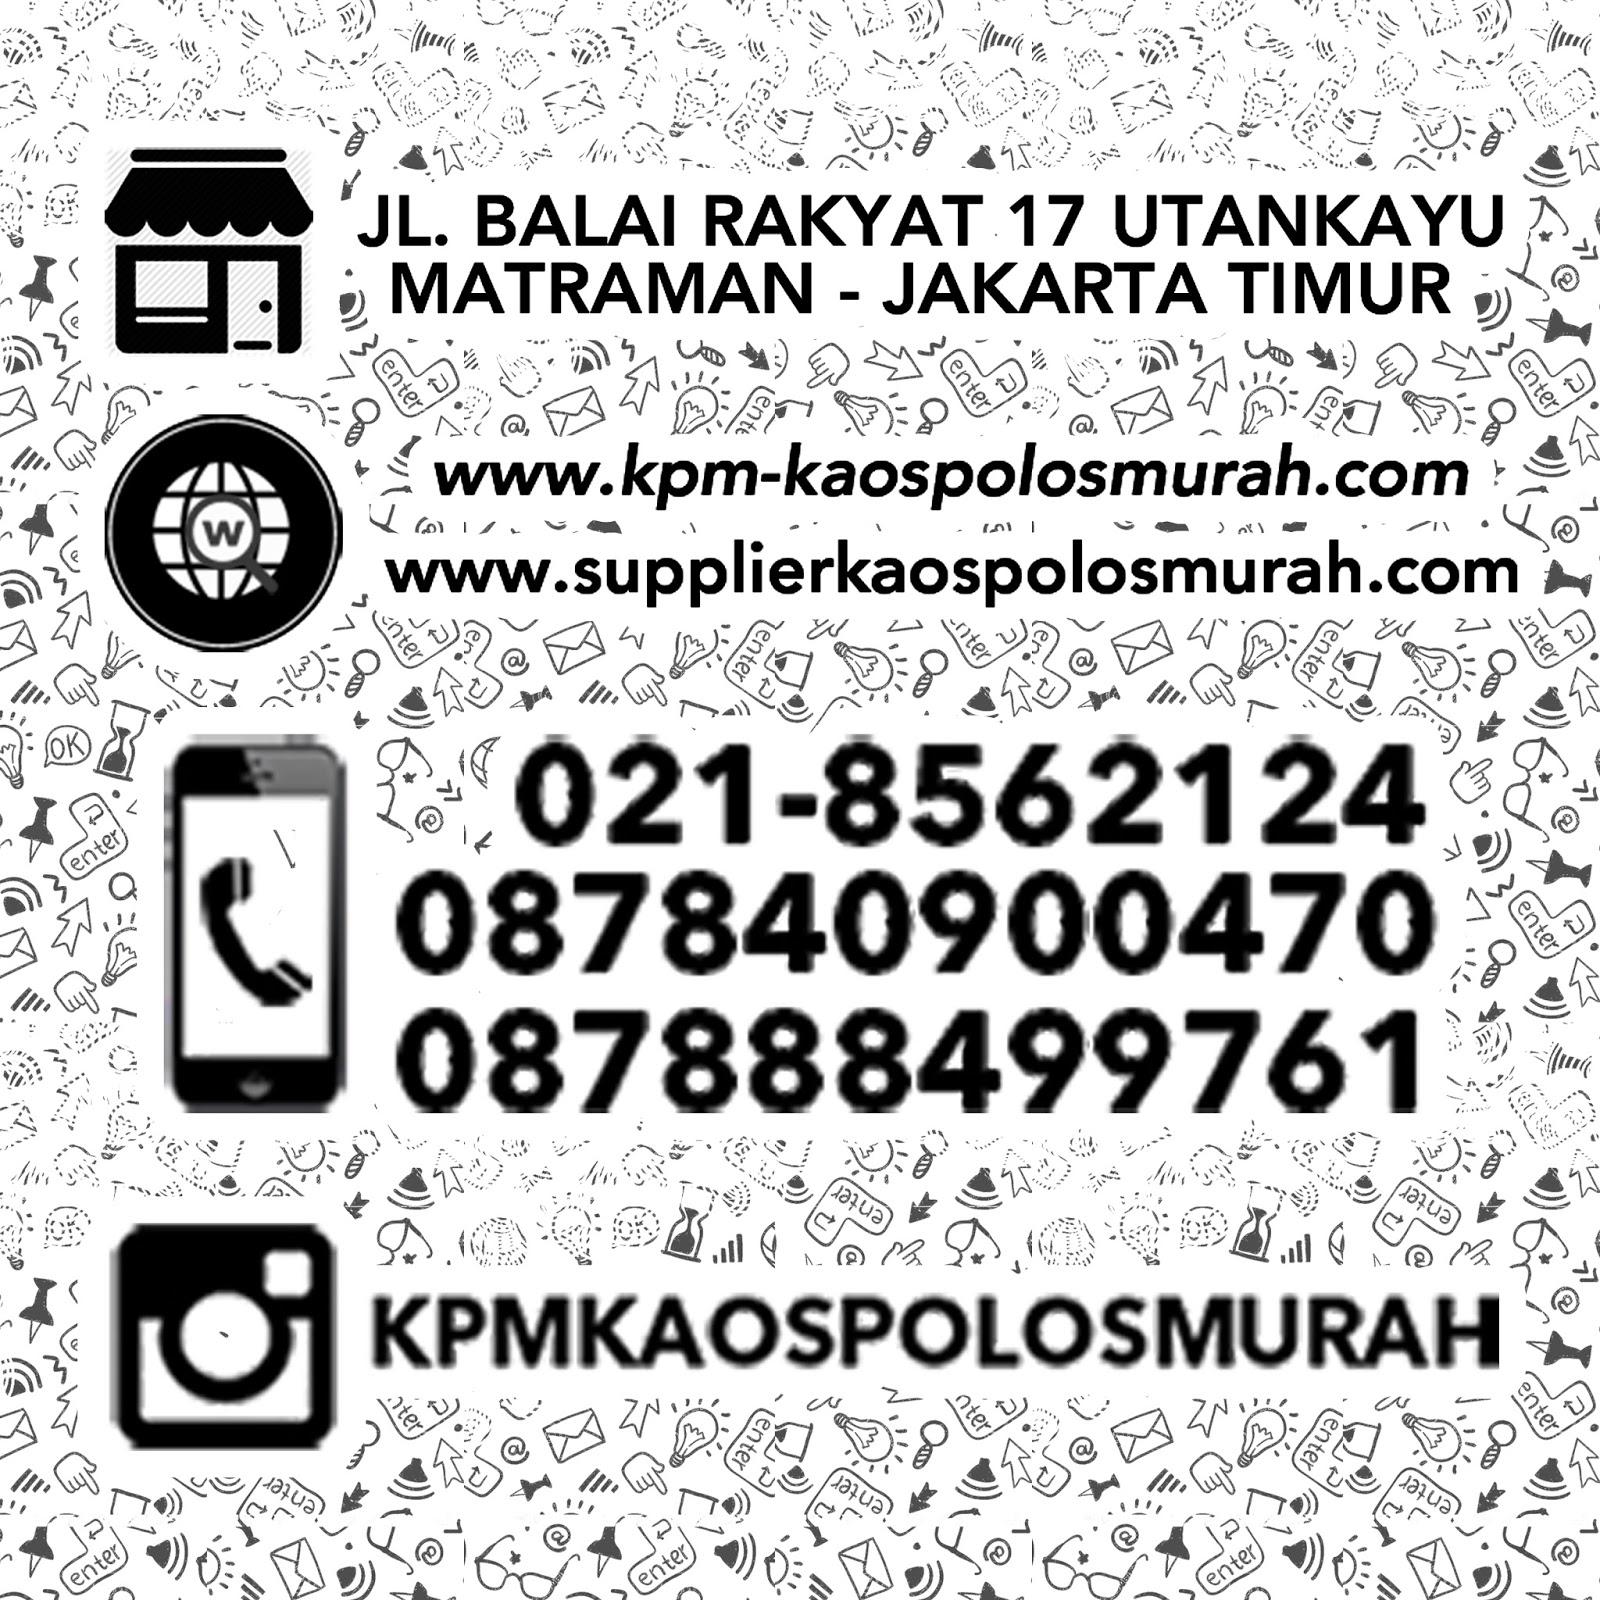 Kpm Supplier Kaos Polos Murah Grosir Combed Dan Jasa Coklat Cotton 30s Update Juni 2017 Jakarta Timur